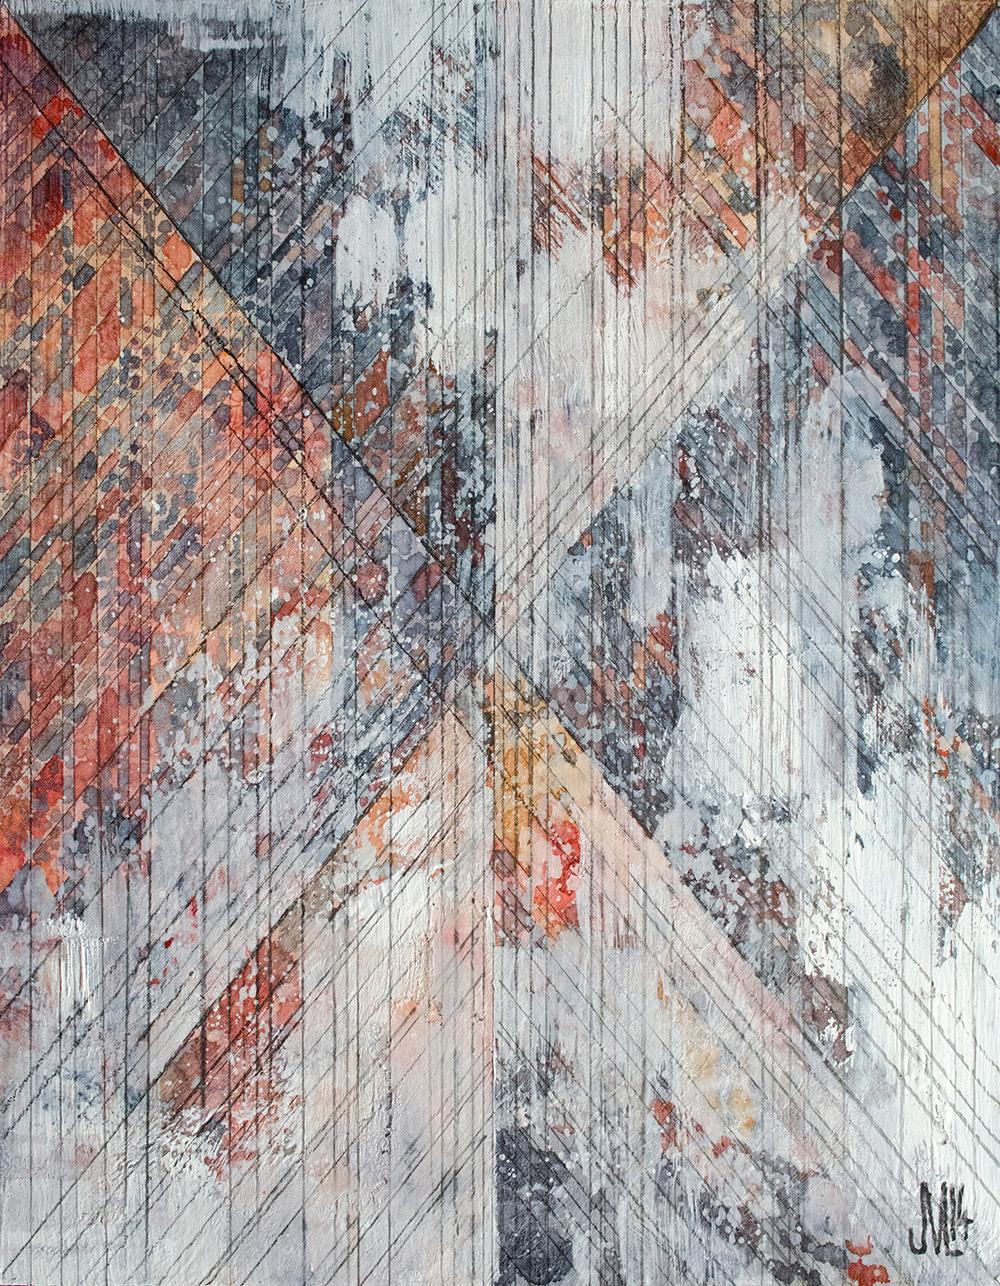 "Plenum  Watercolor, acrylic, and graphite on panel 11 x 14"" 2014"